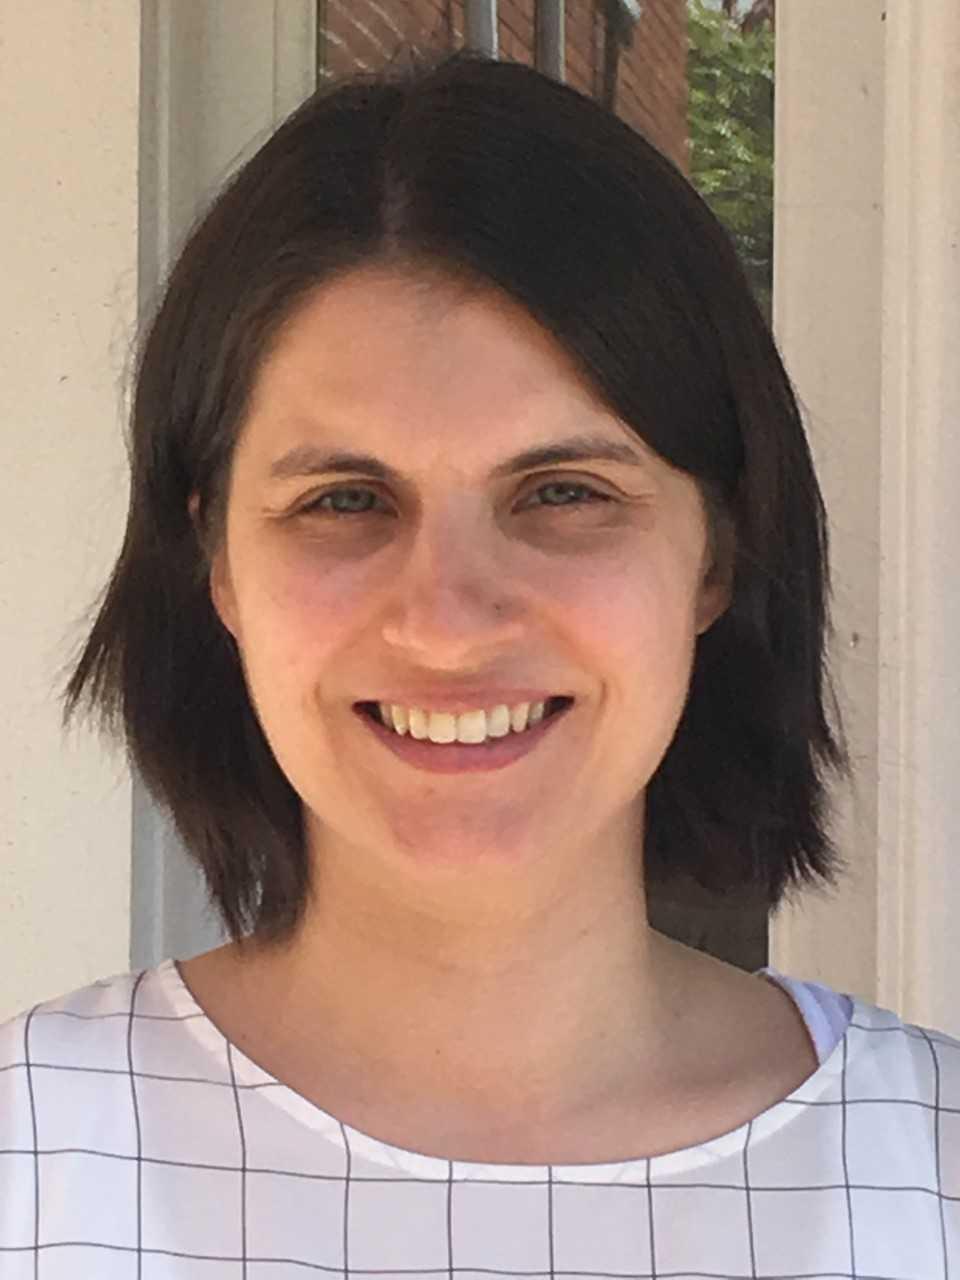 Laura Hohm